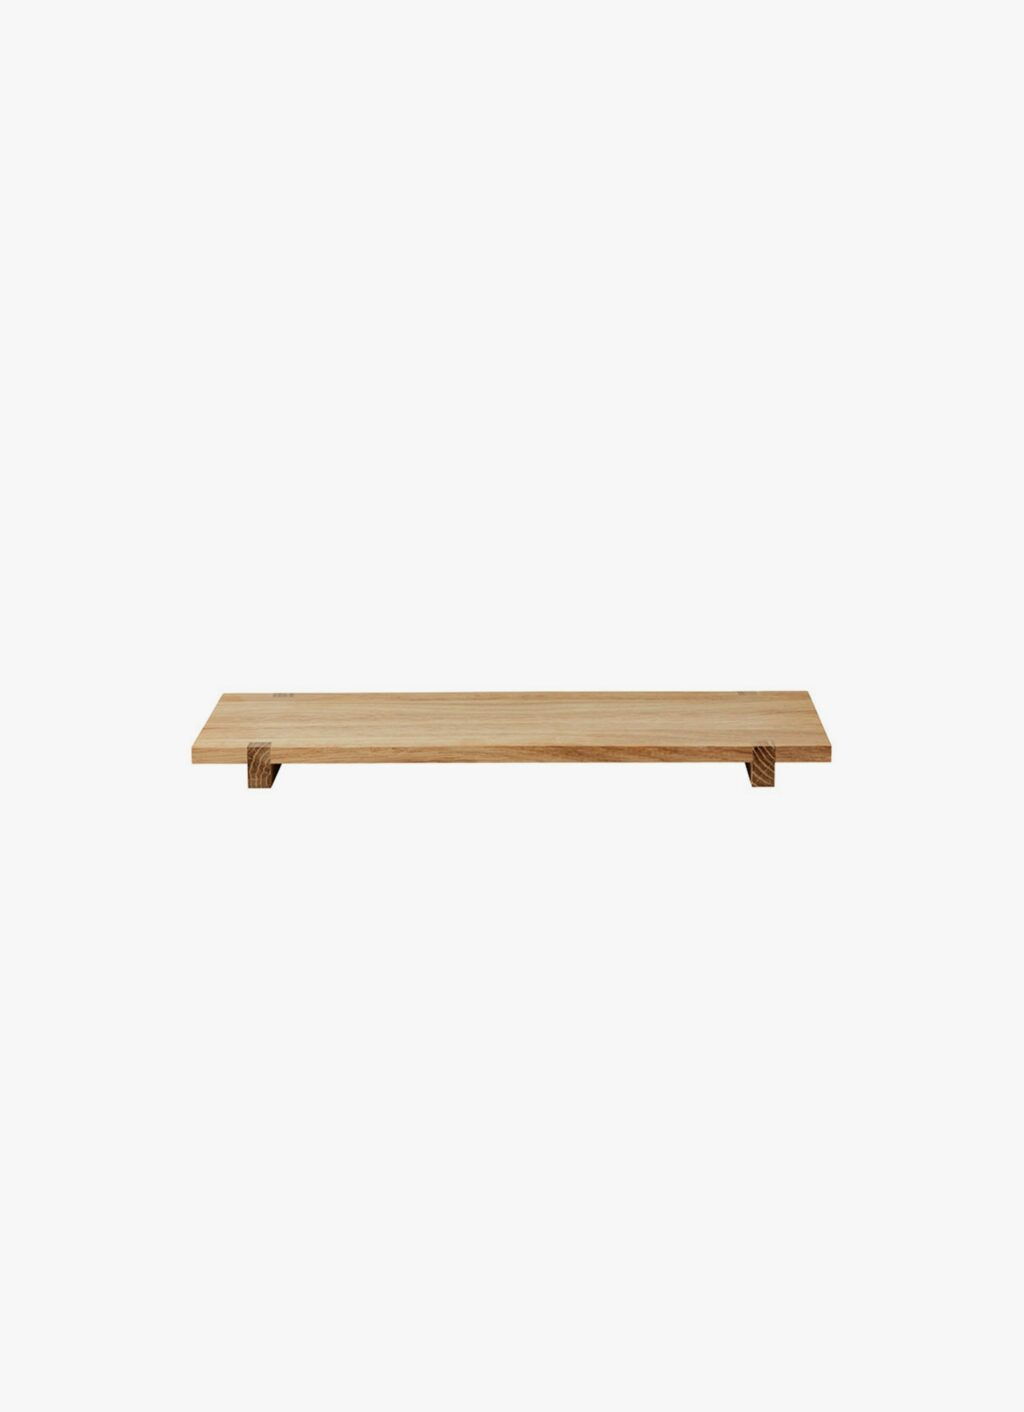 Kristina Dam Studio - Japanese Wood Board - Large